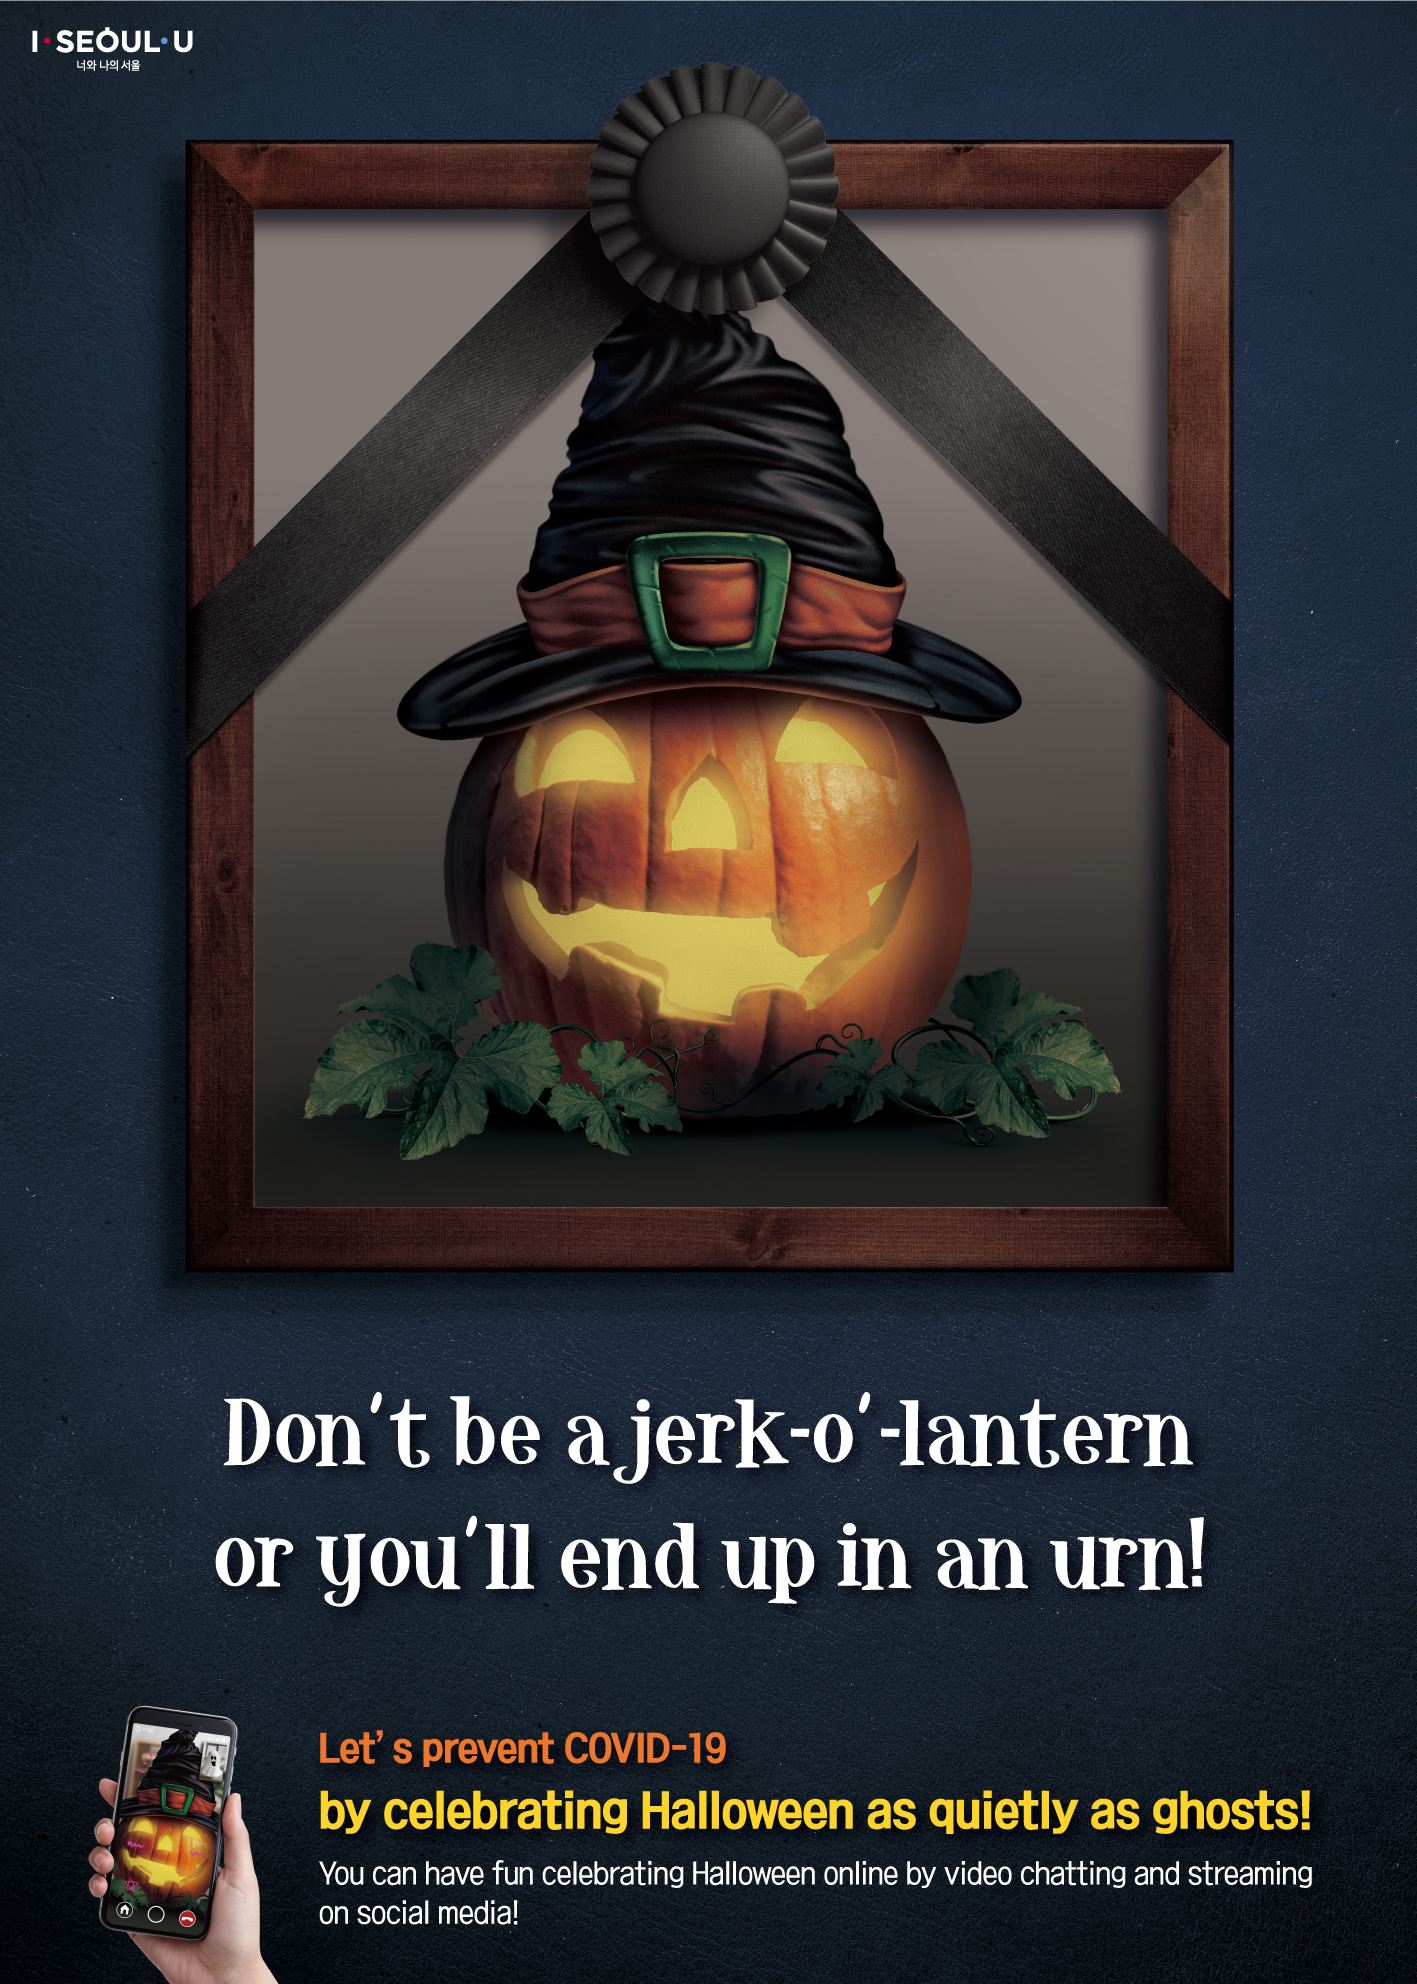 Don't be a jerk-o'-latern or you'll end up in an urn!